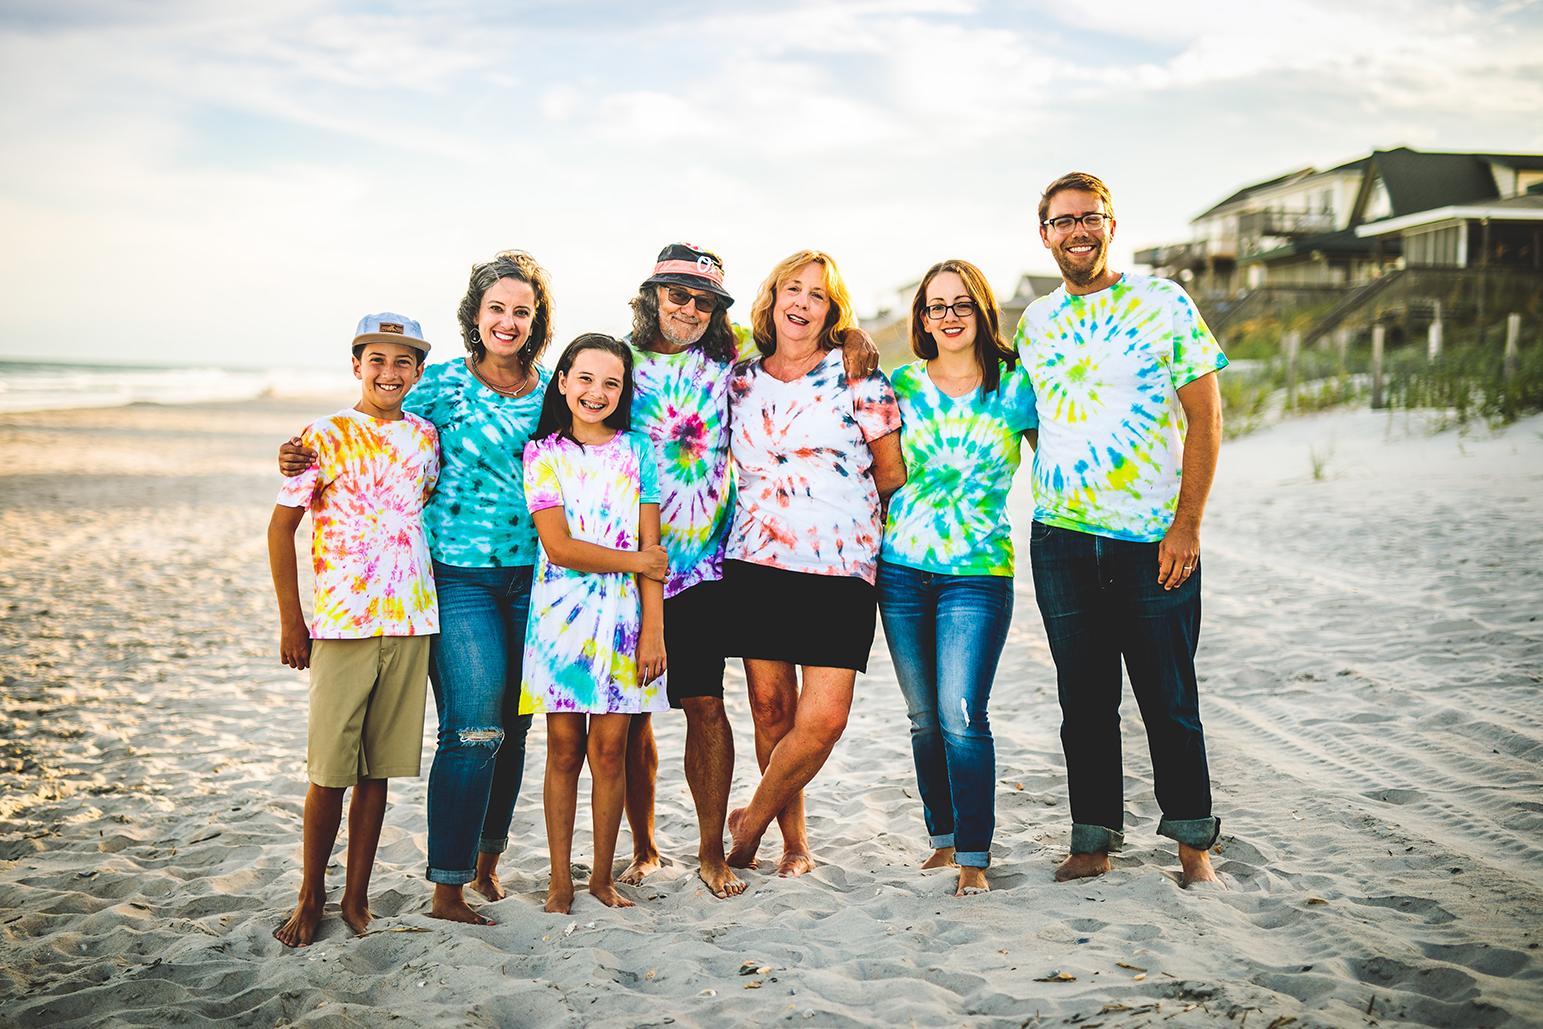 Family in Tie dye shirts.jpg